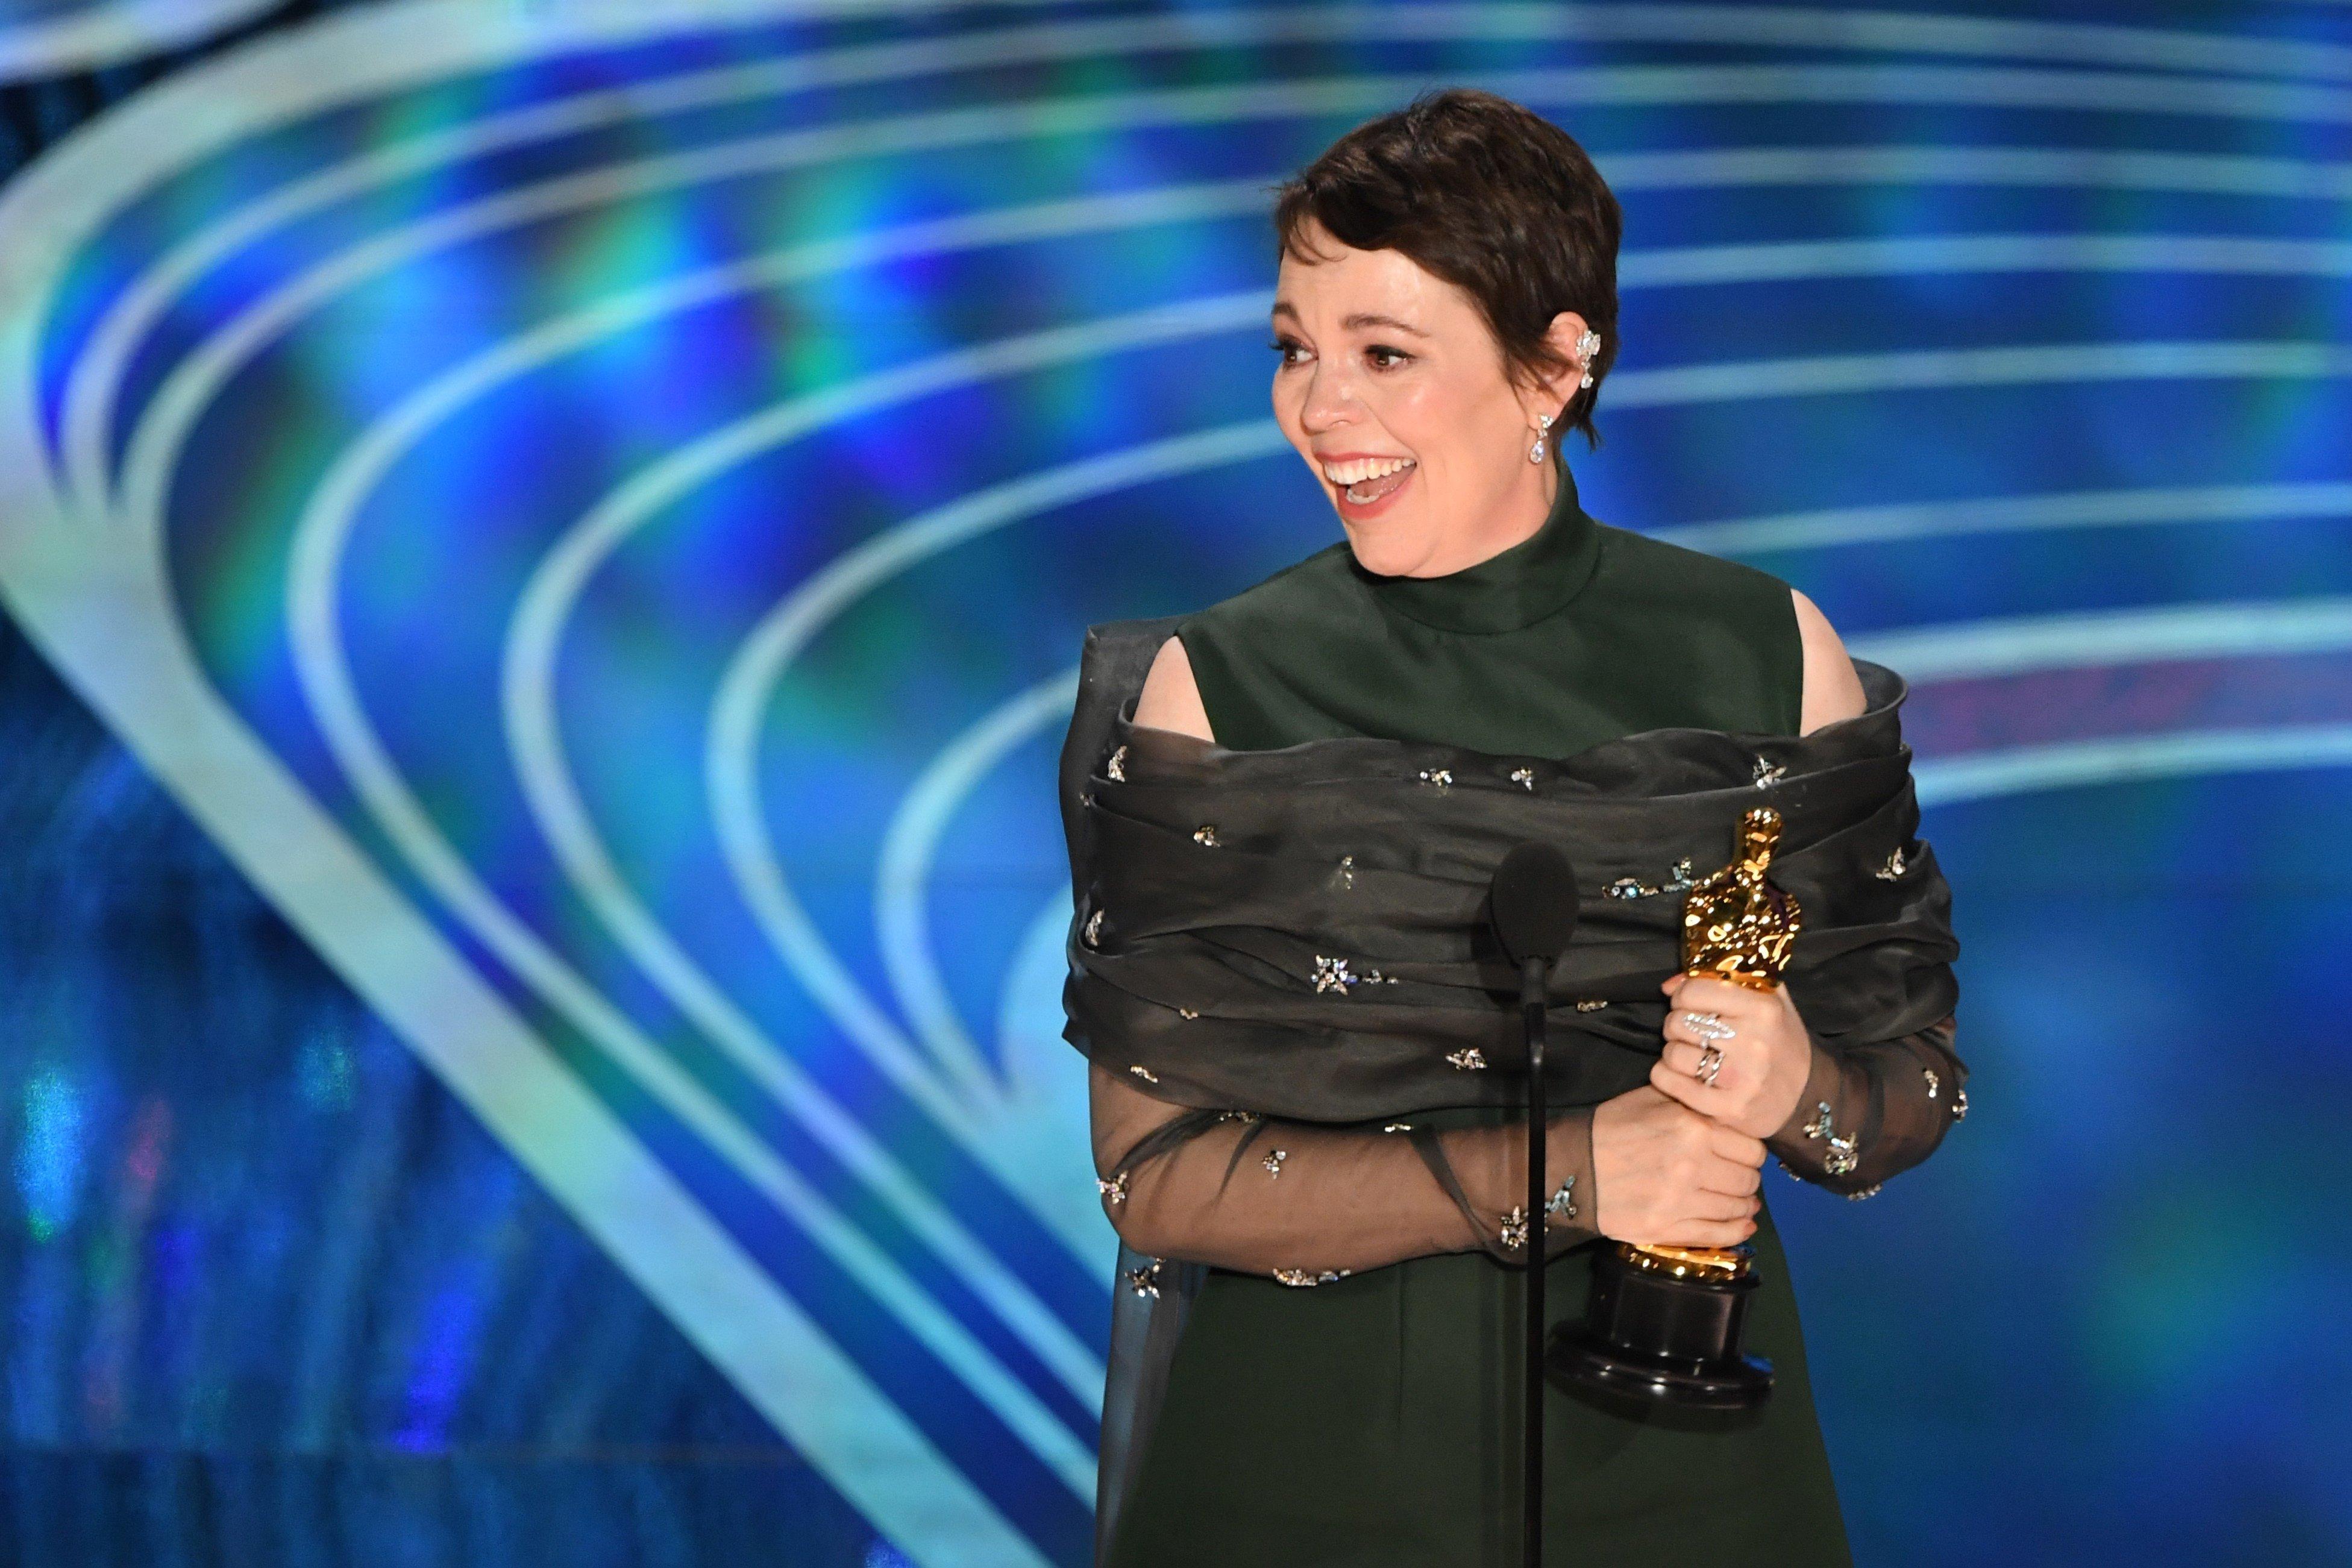 Olivia Colman Wins Best Actress at Oscars 2019!